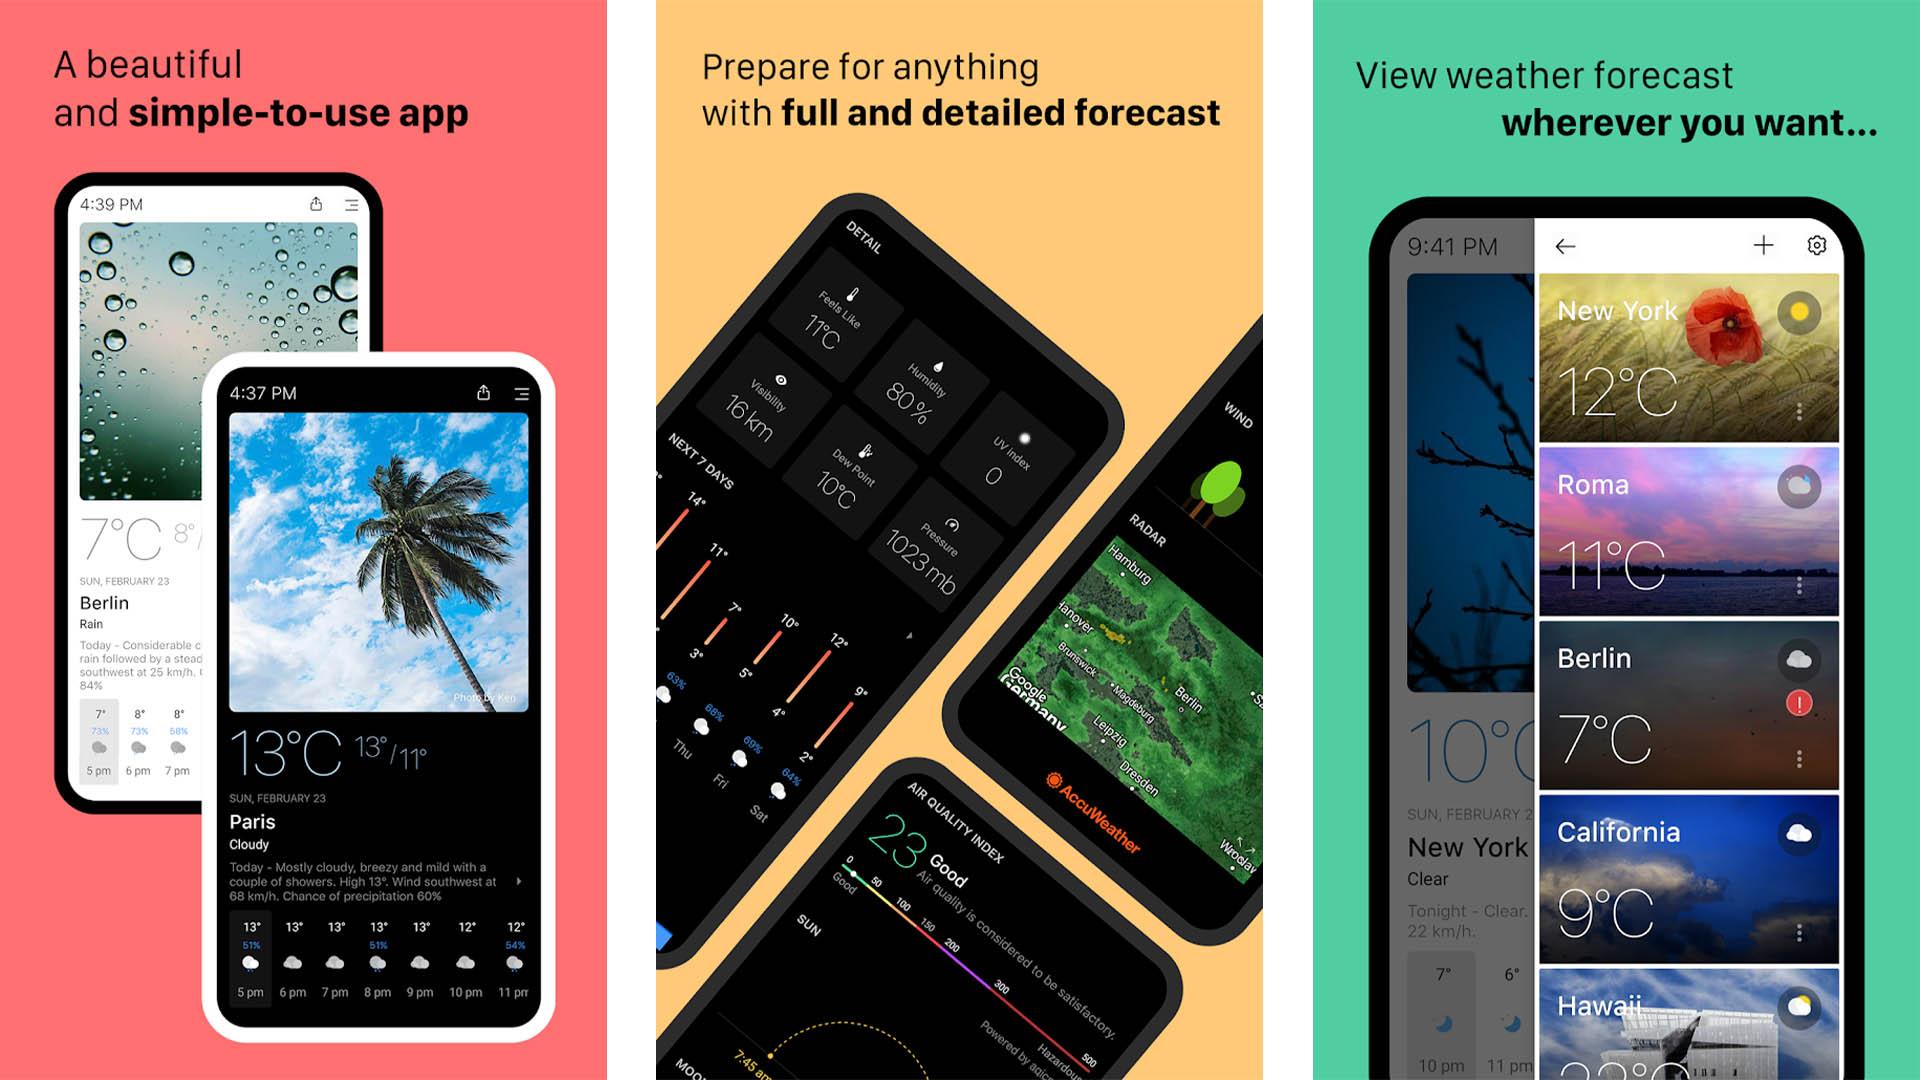 Today Weather screenshot 2020